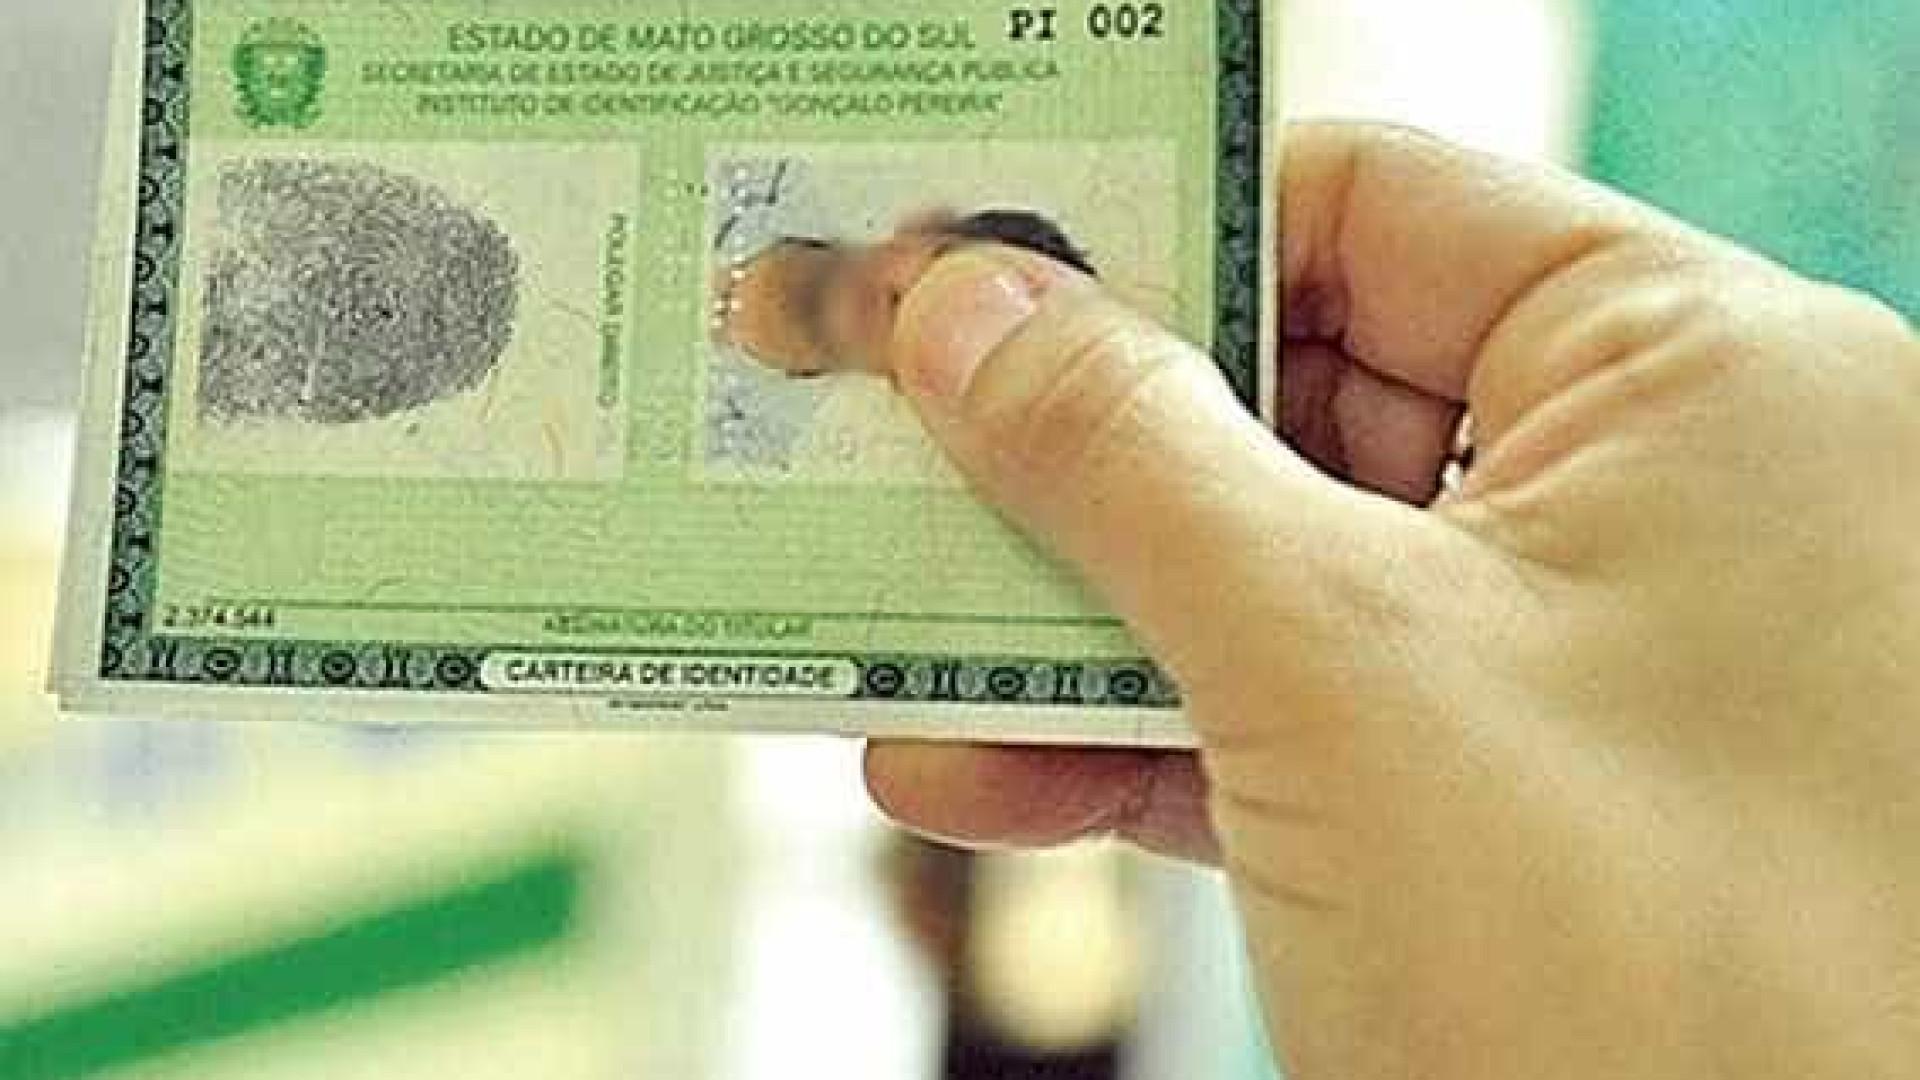 Governo publicará decreto que protegerá identidade de denunciantes